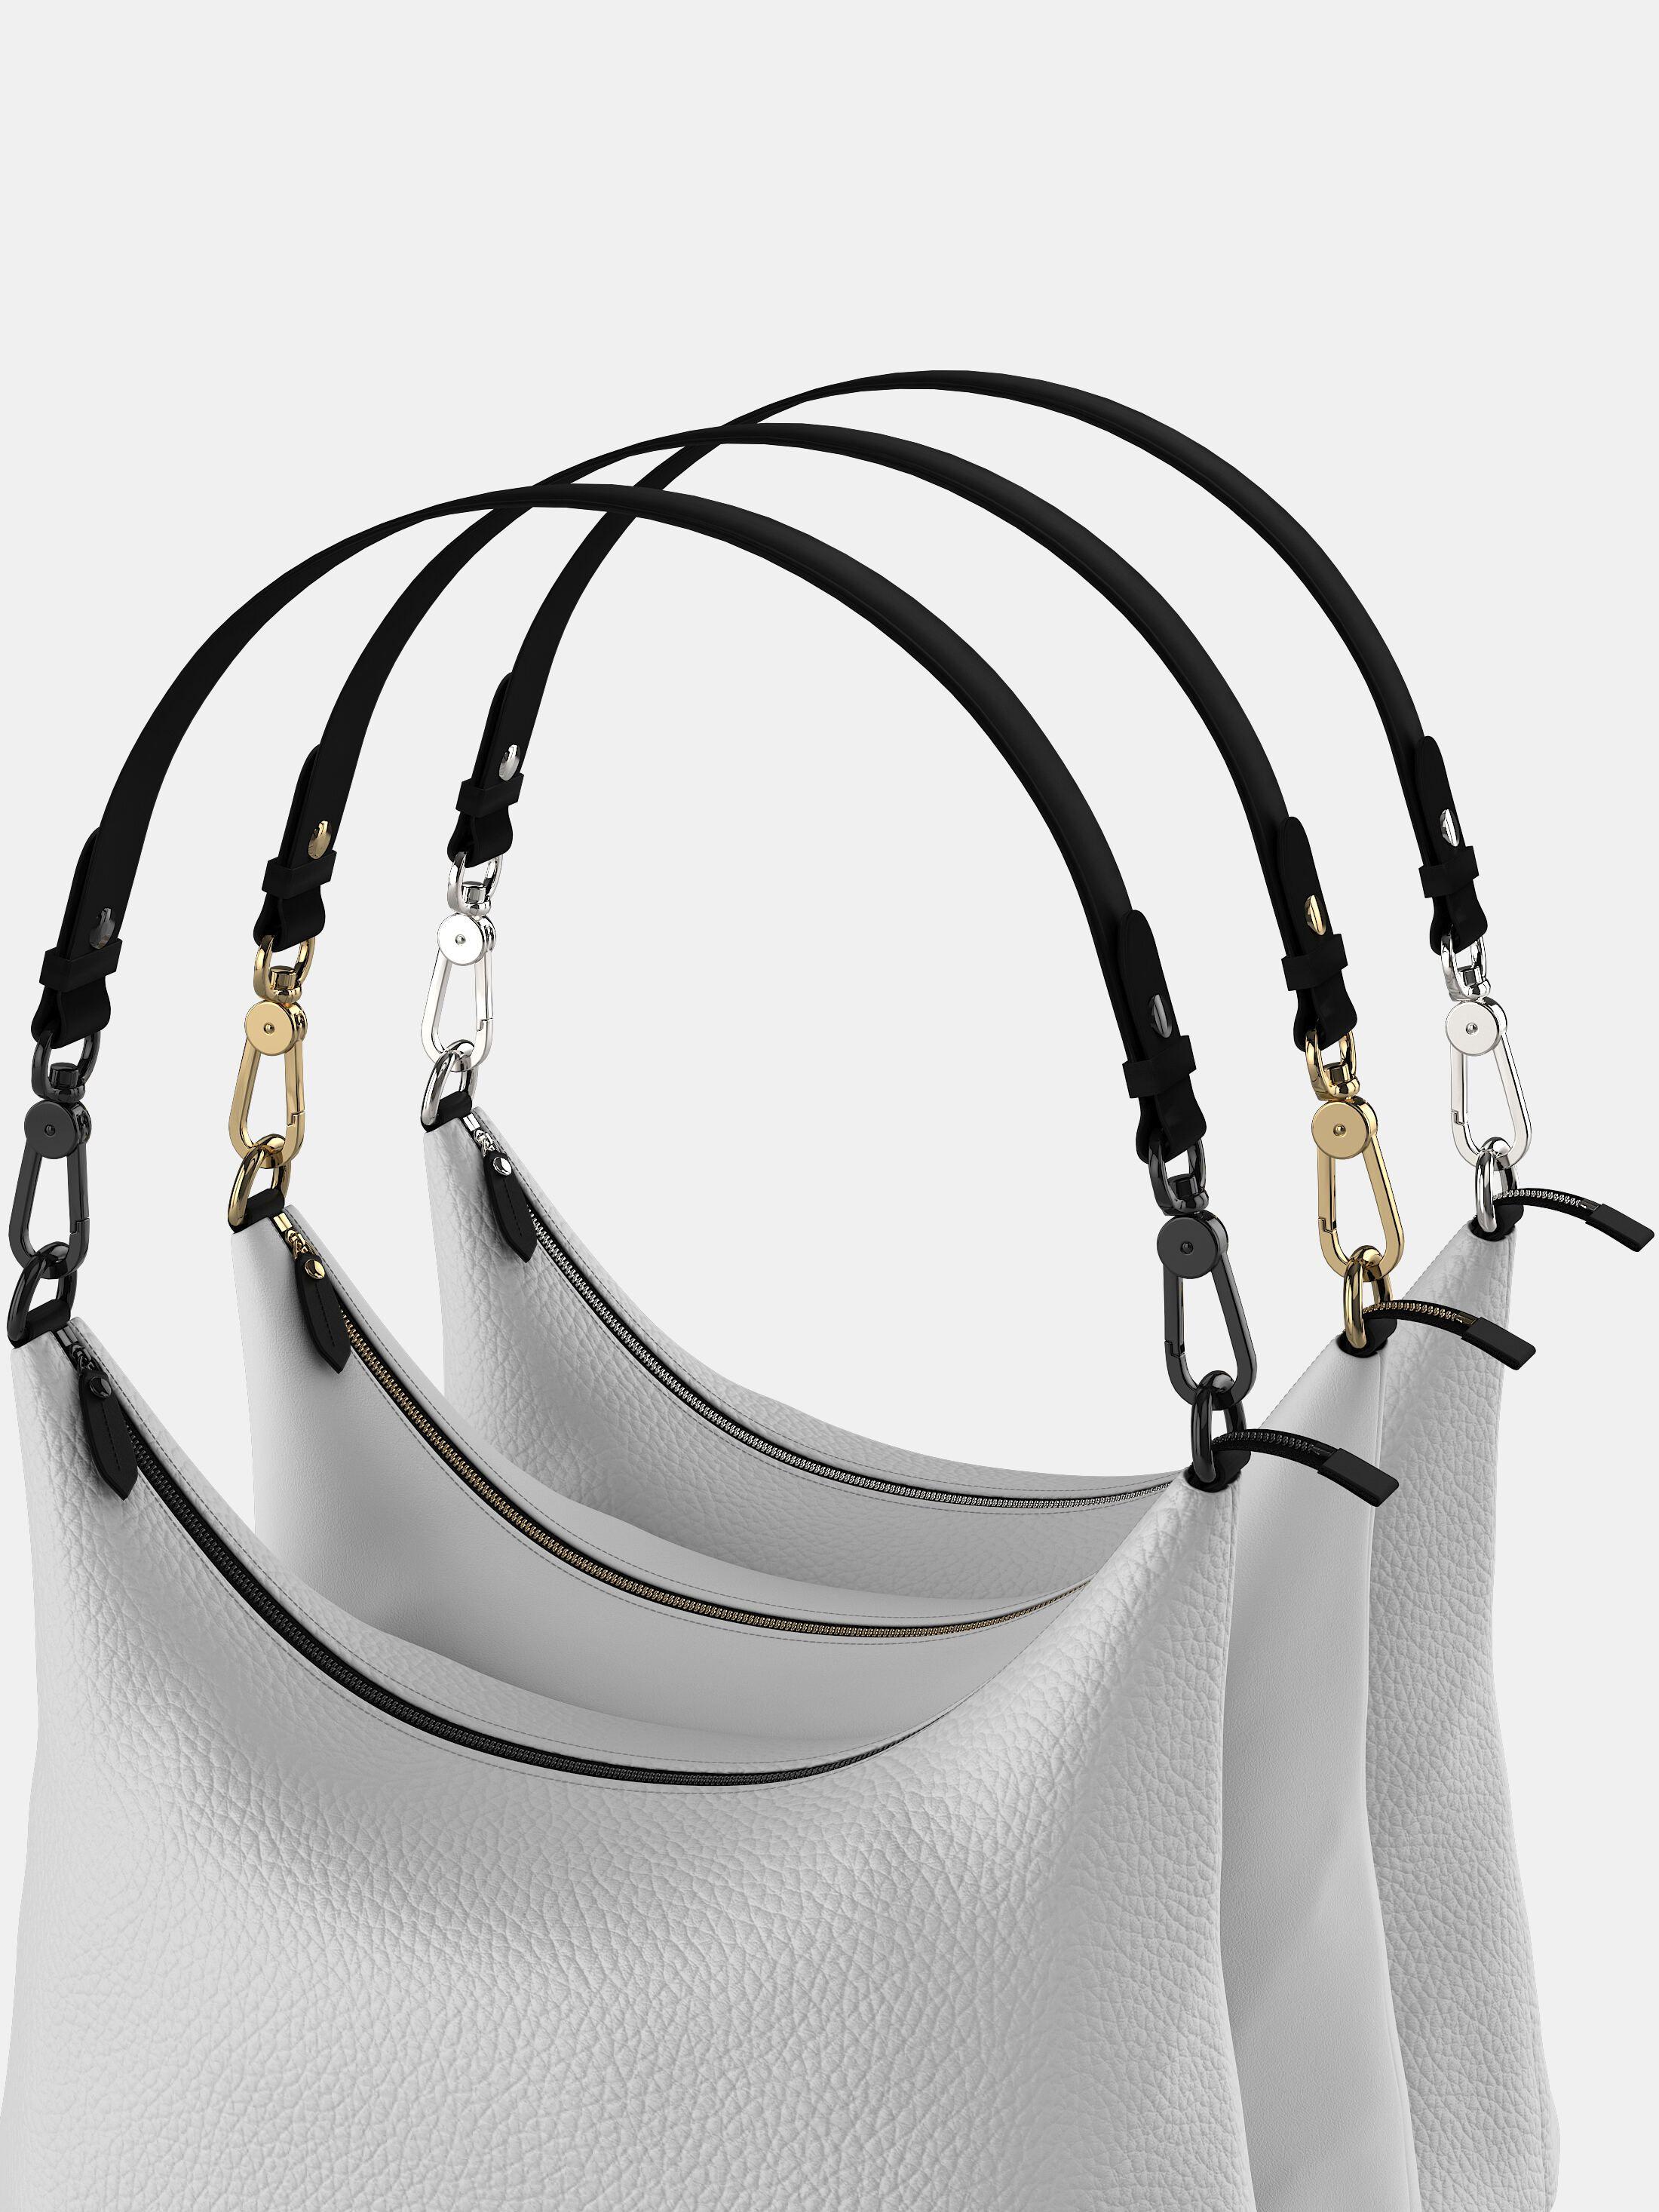 ontwerpopties gepersonaliseerde hobo tassen